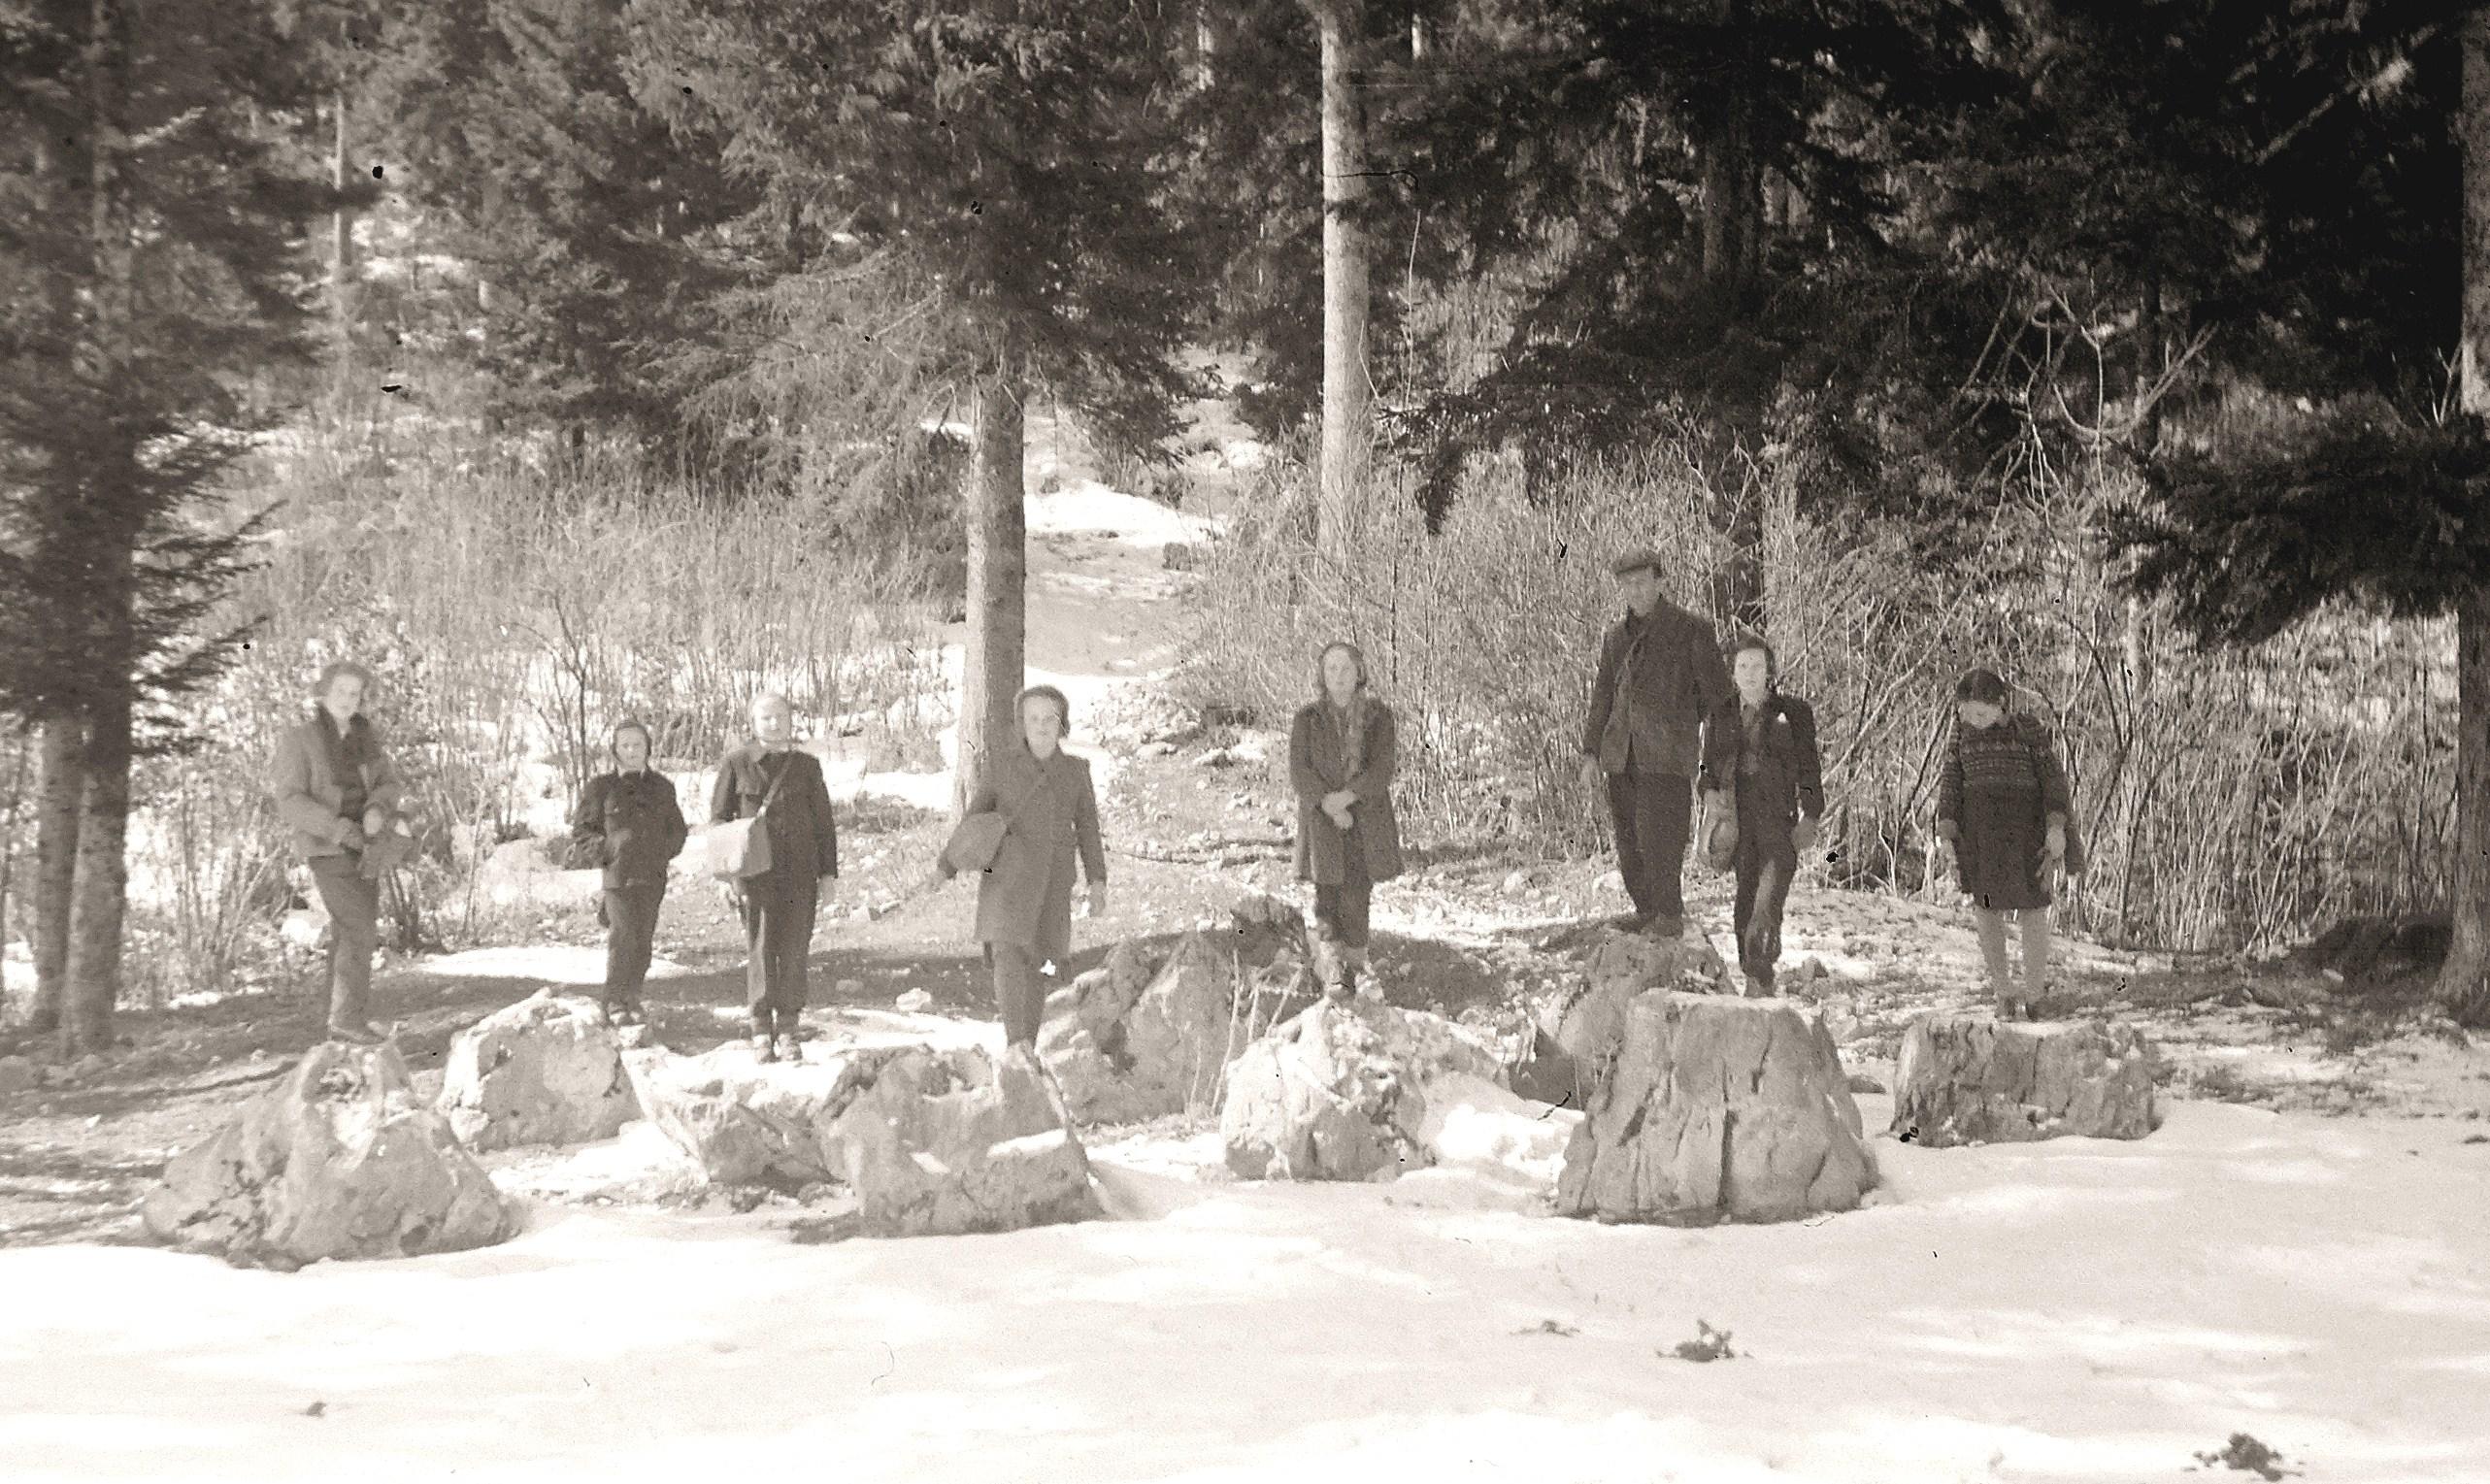 Kamniti krog DSC_7568 (foto Žnidaršič, 25-3-'15), obr.